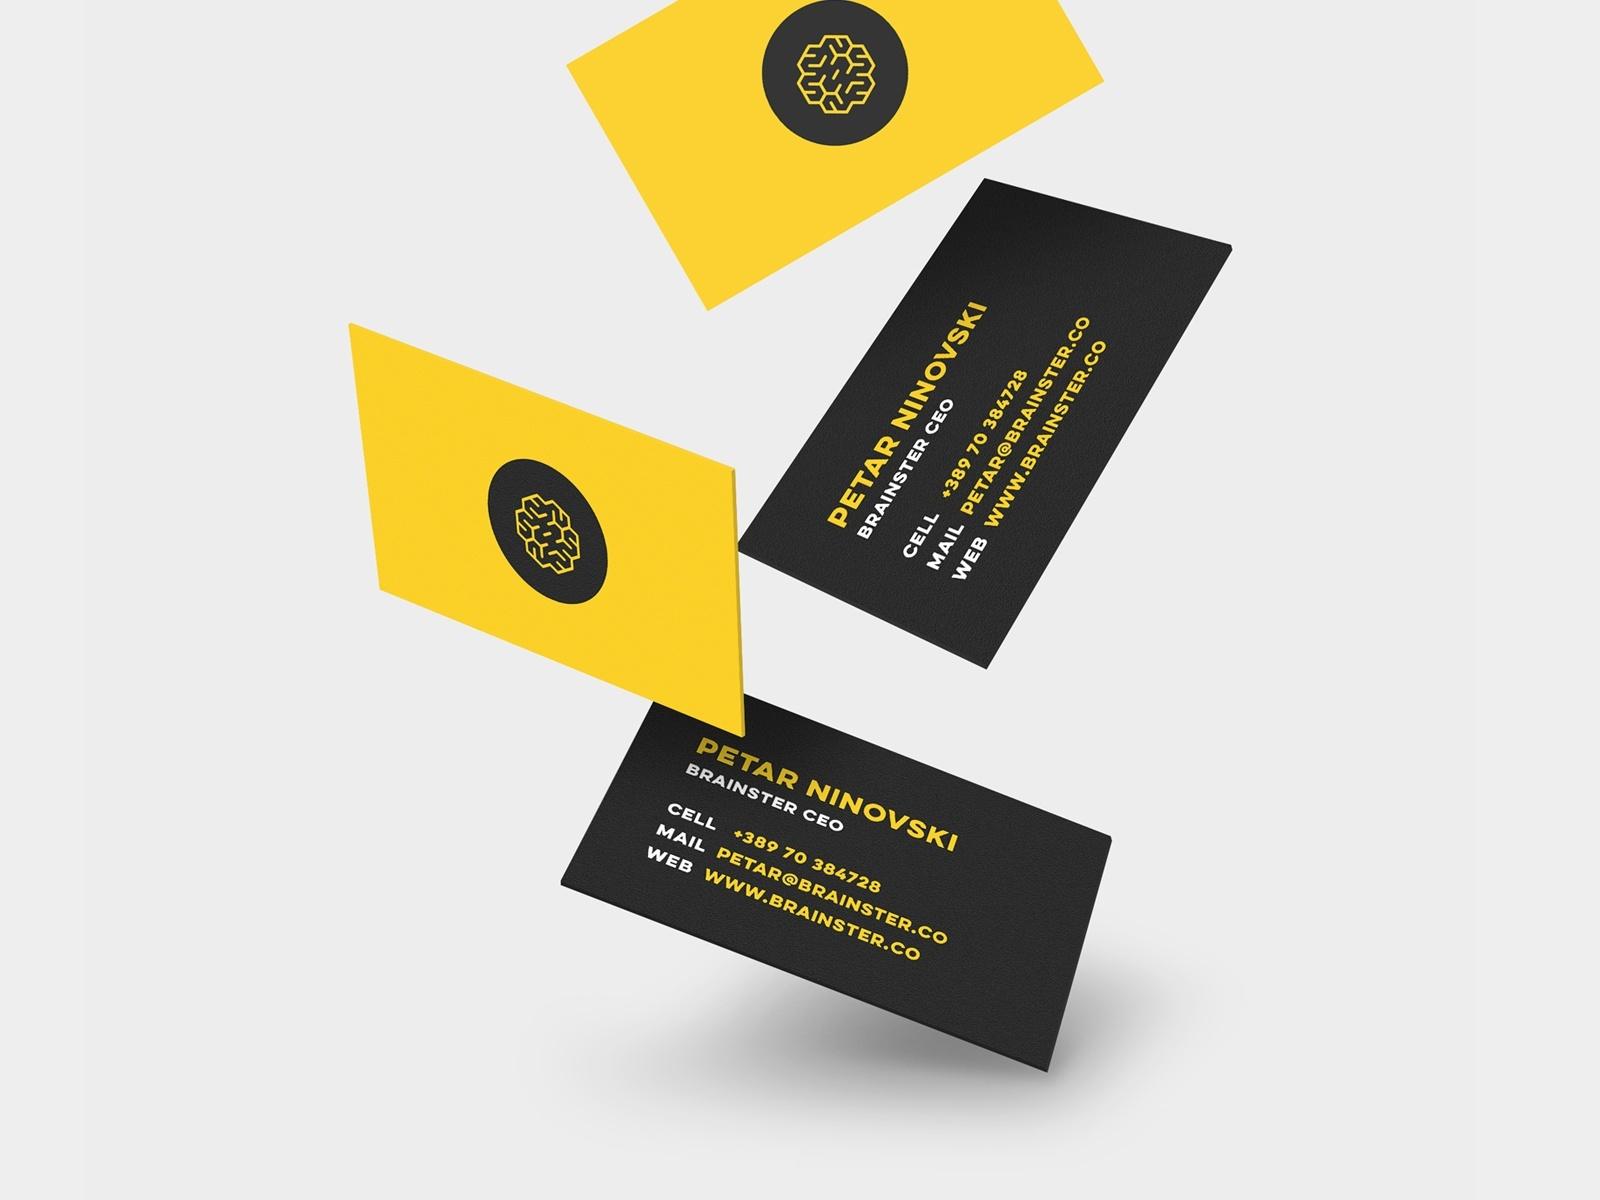 Brainster-PogonWeb-Bcard